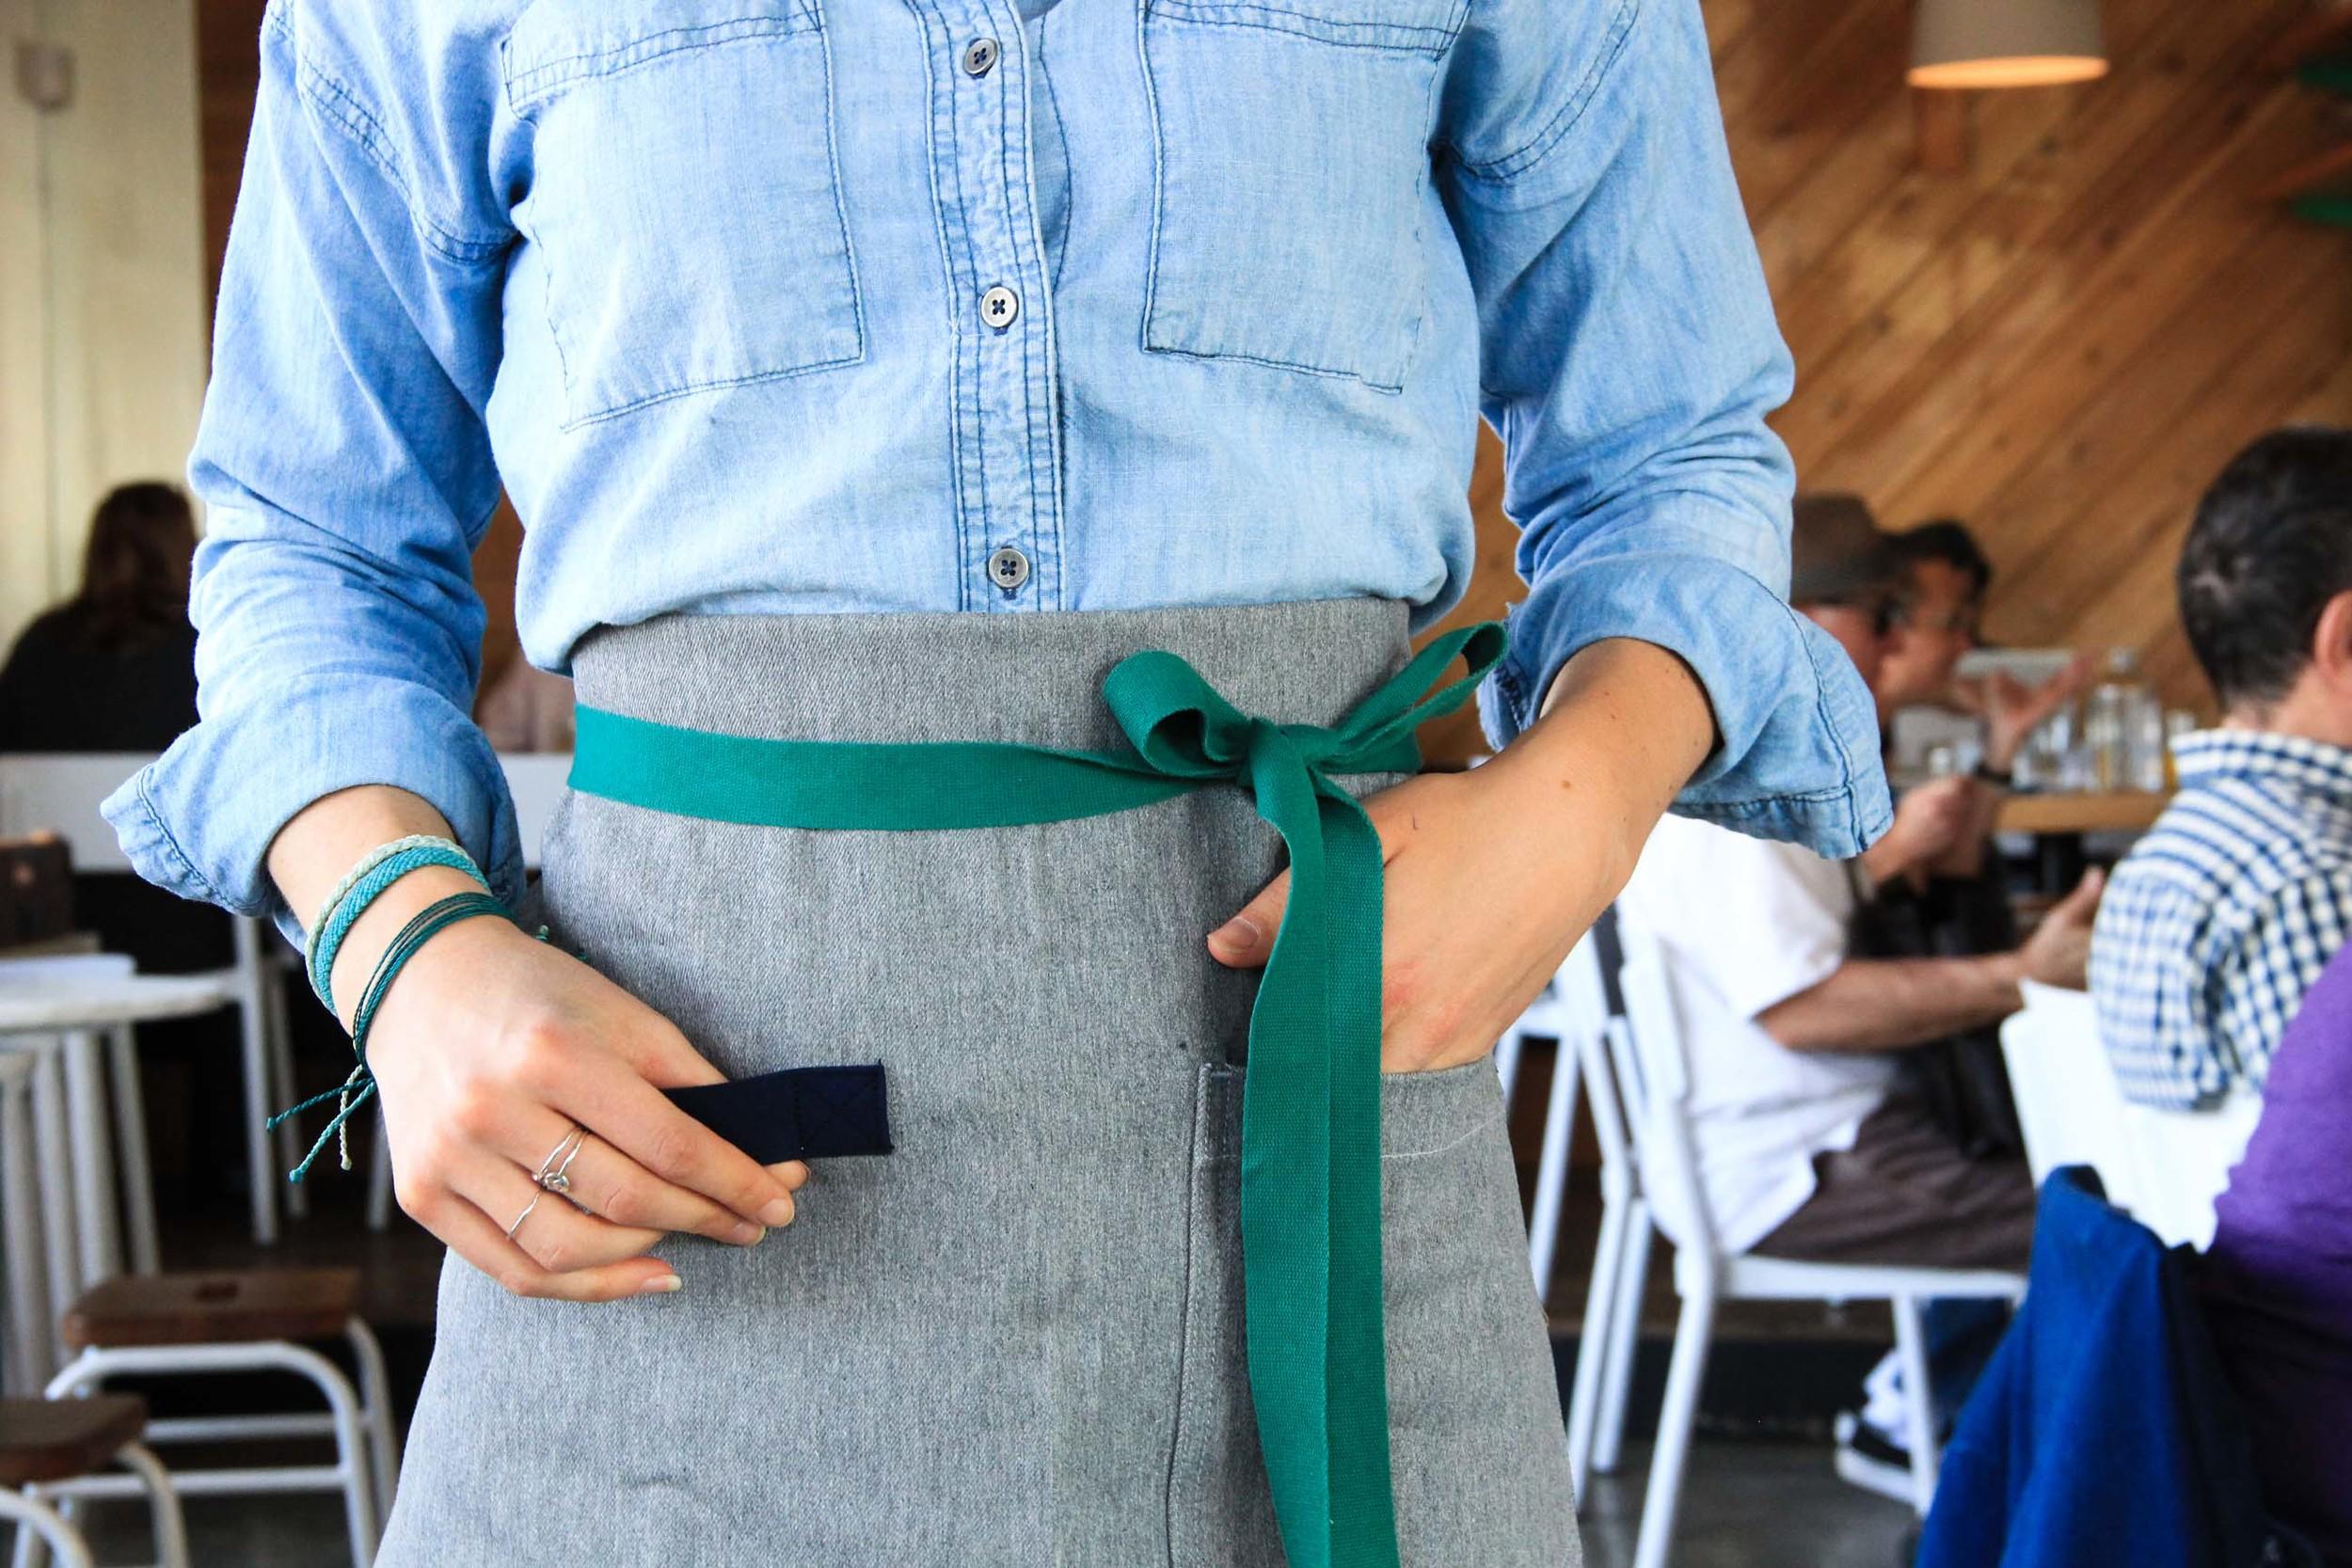 Blue apron hiring - Hiring